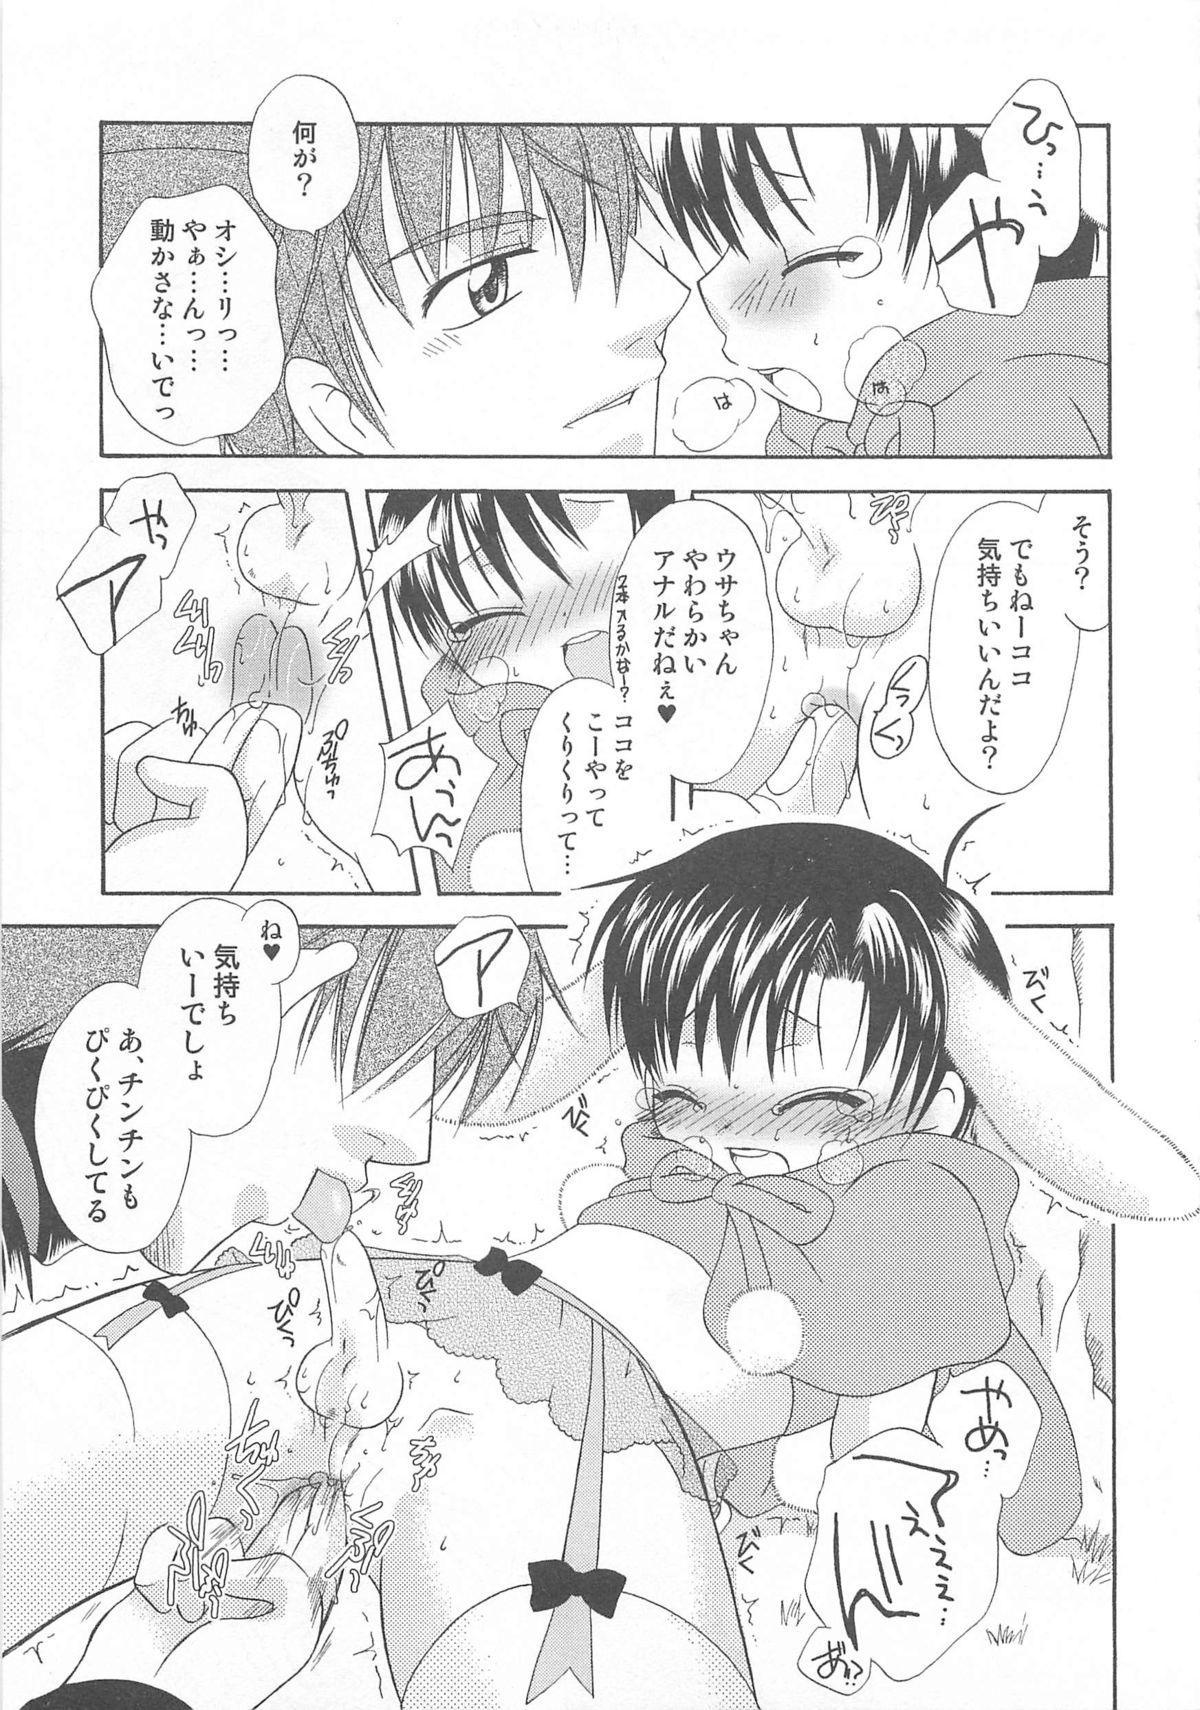 Otokonoko HEAVEN Vol. 02 Dokidoki Chikan Taiken 157